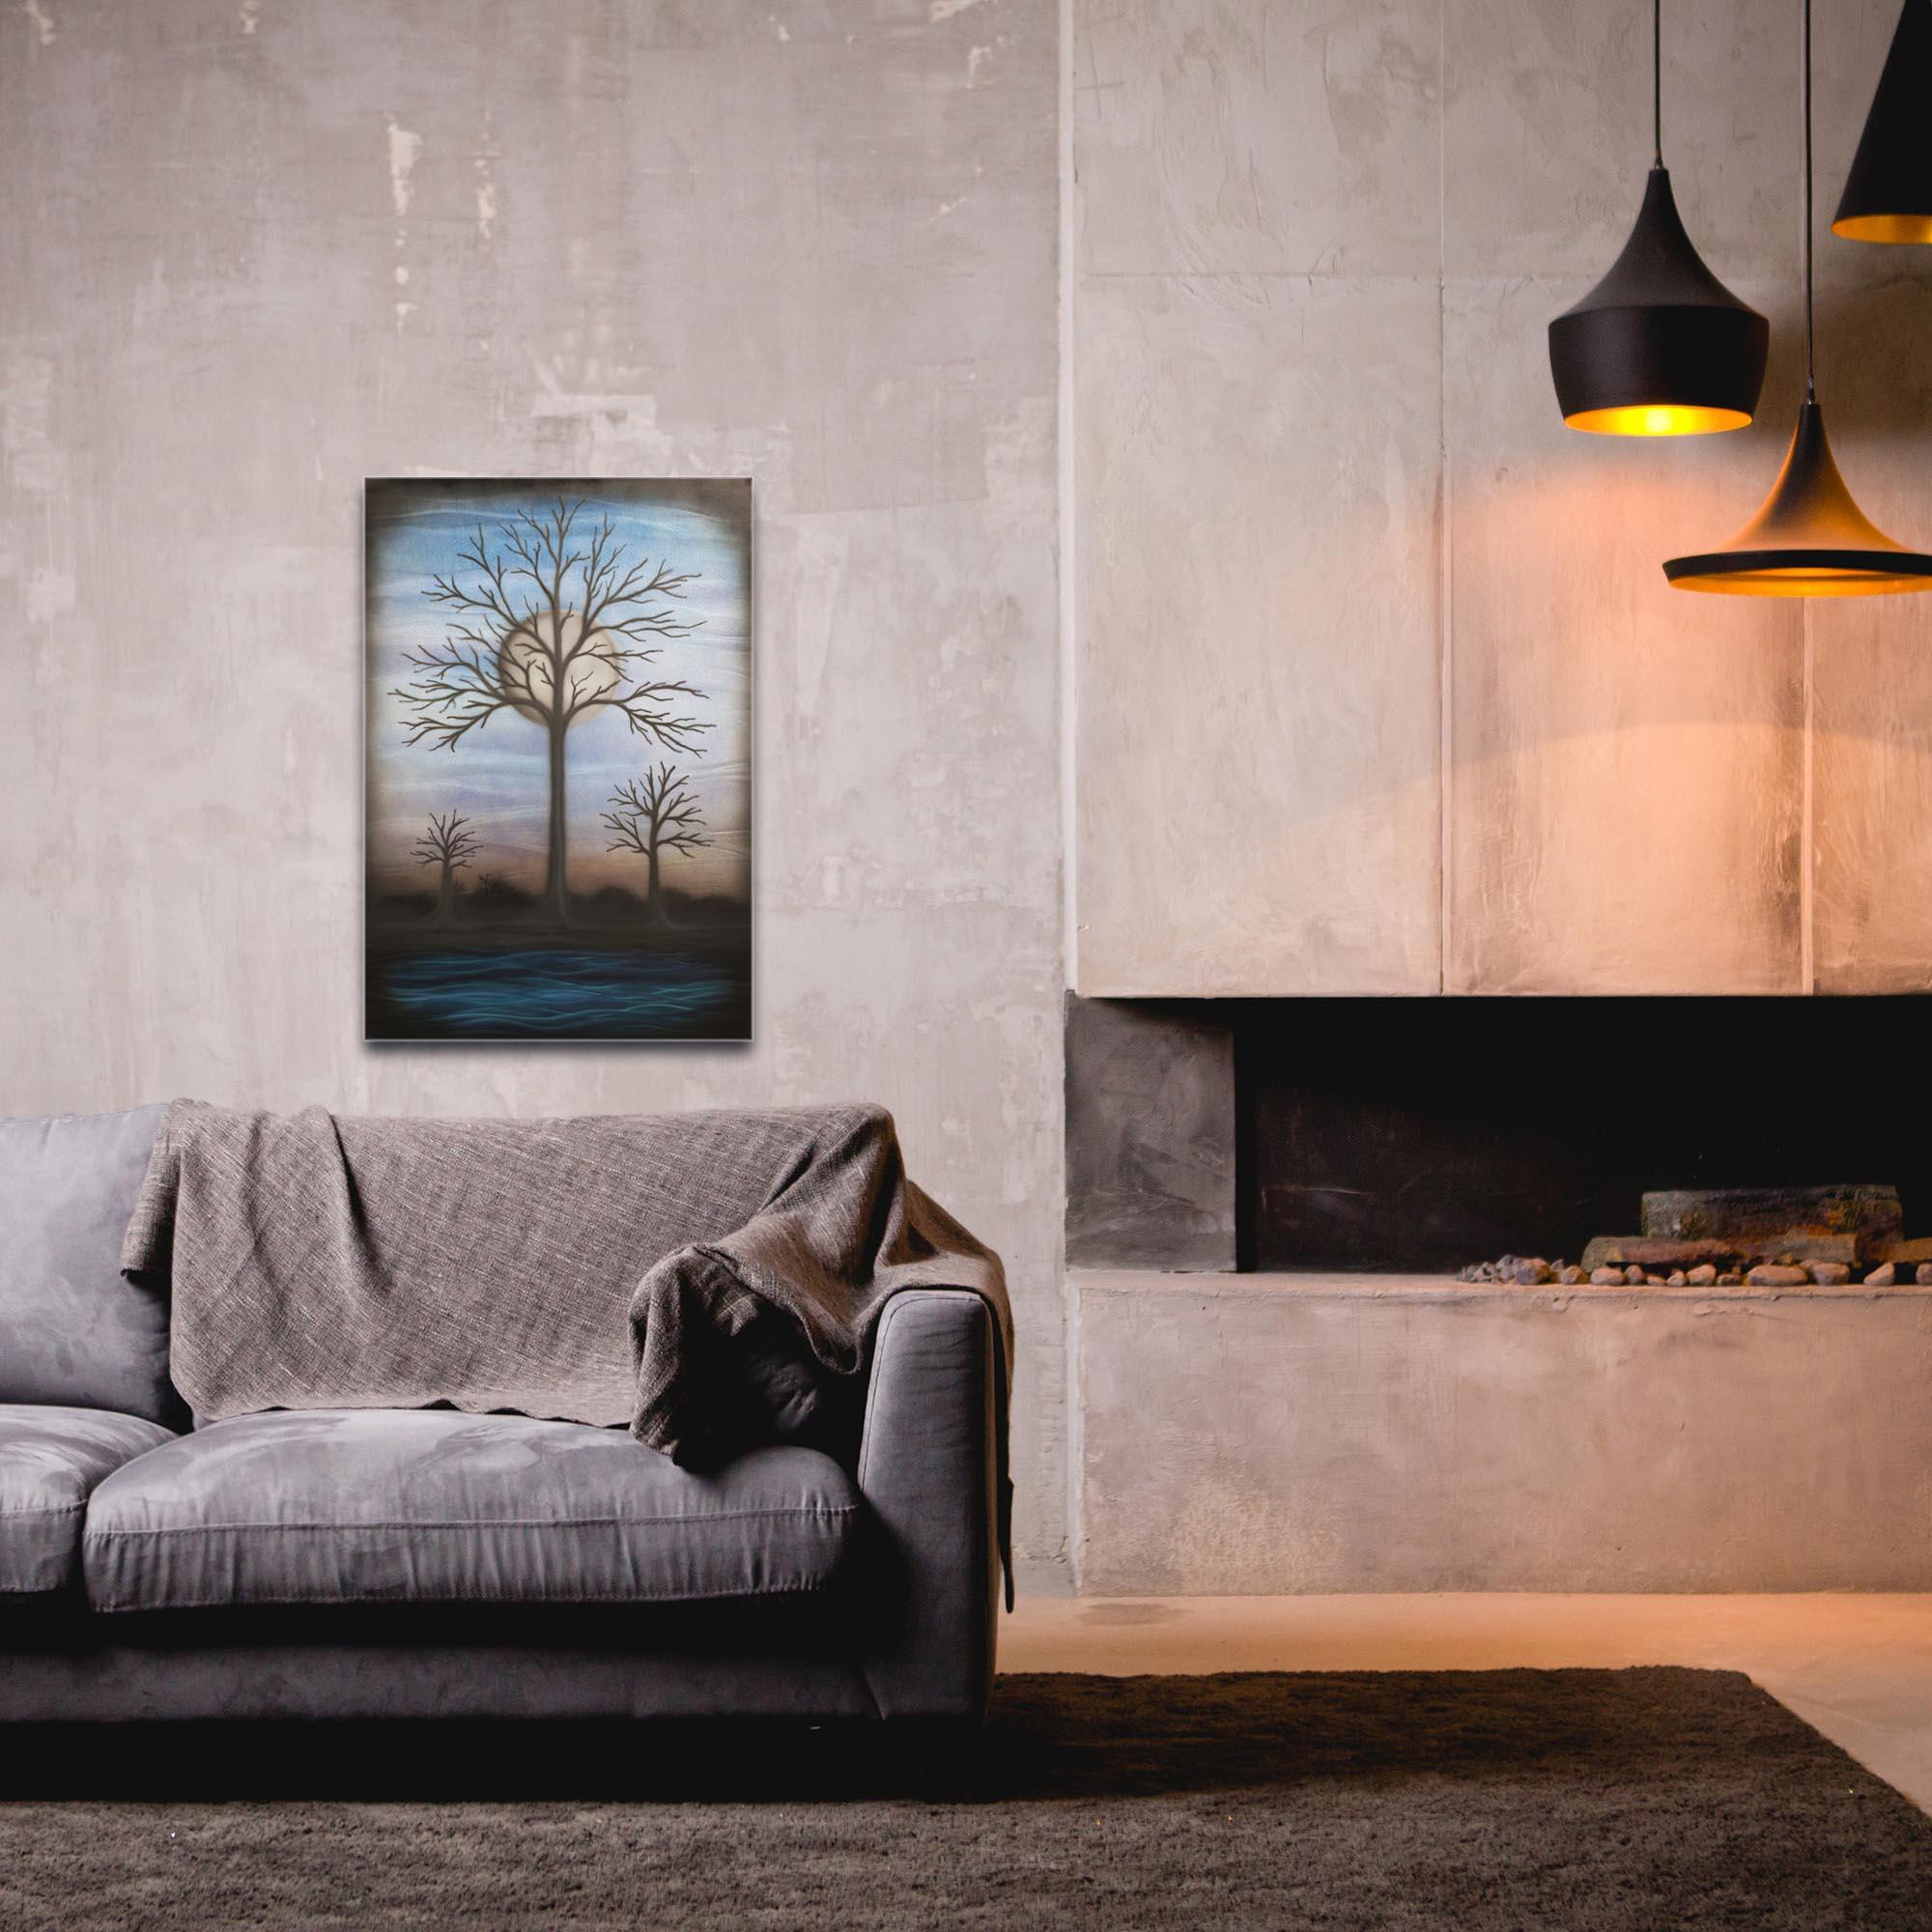 Contemporary Wall Art 'Full Moon' - Bare Trees Decor on Metal or Plexiglass - Image 3